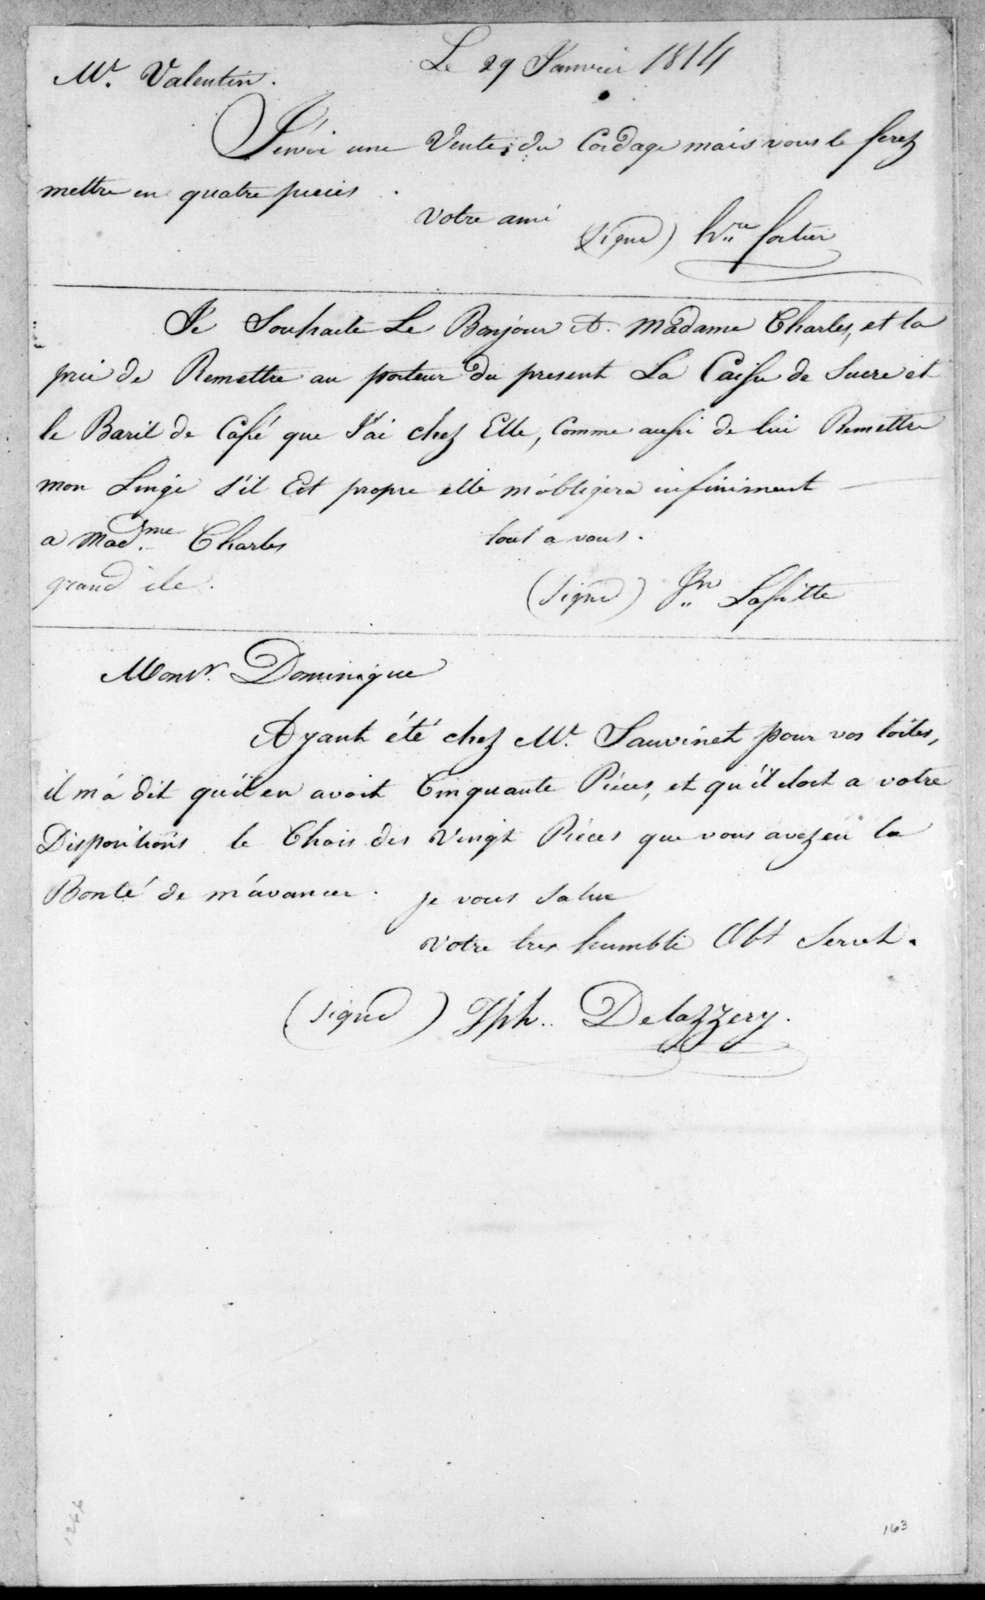 H. Portier to W. Valentin, January 29, 1814